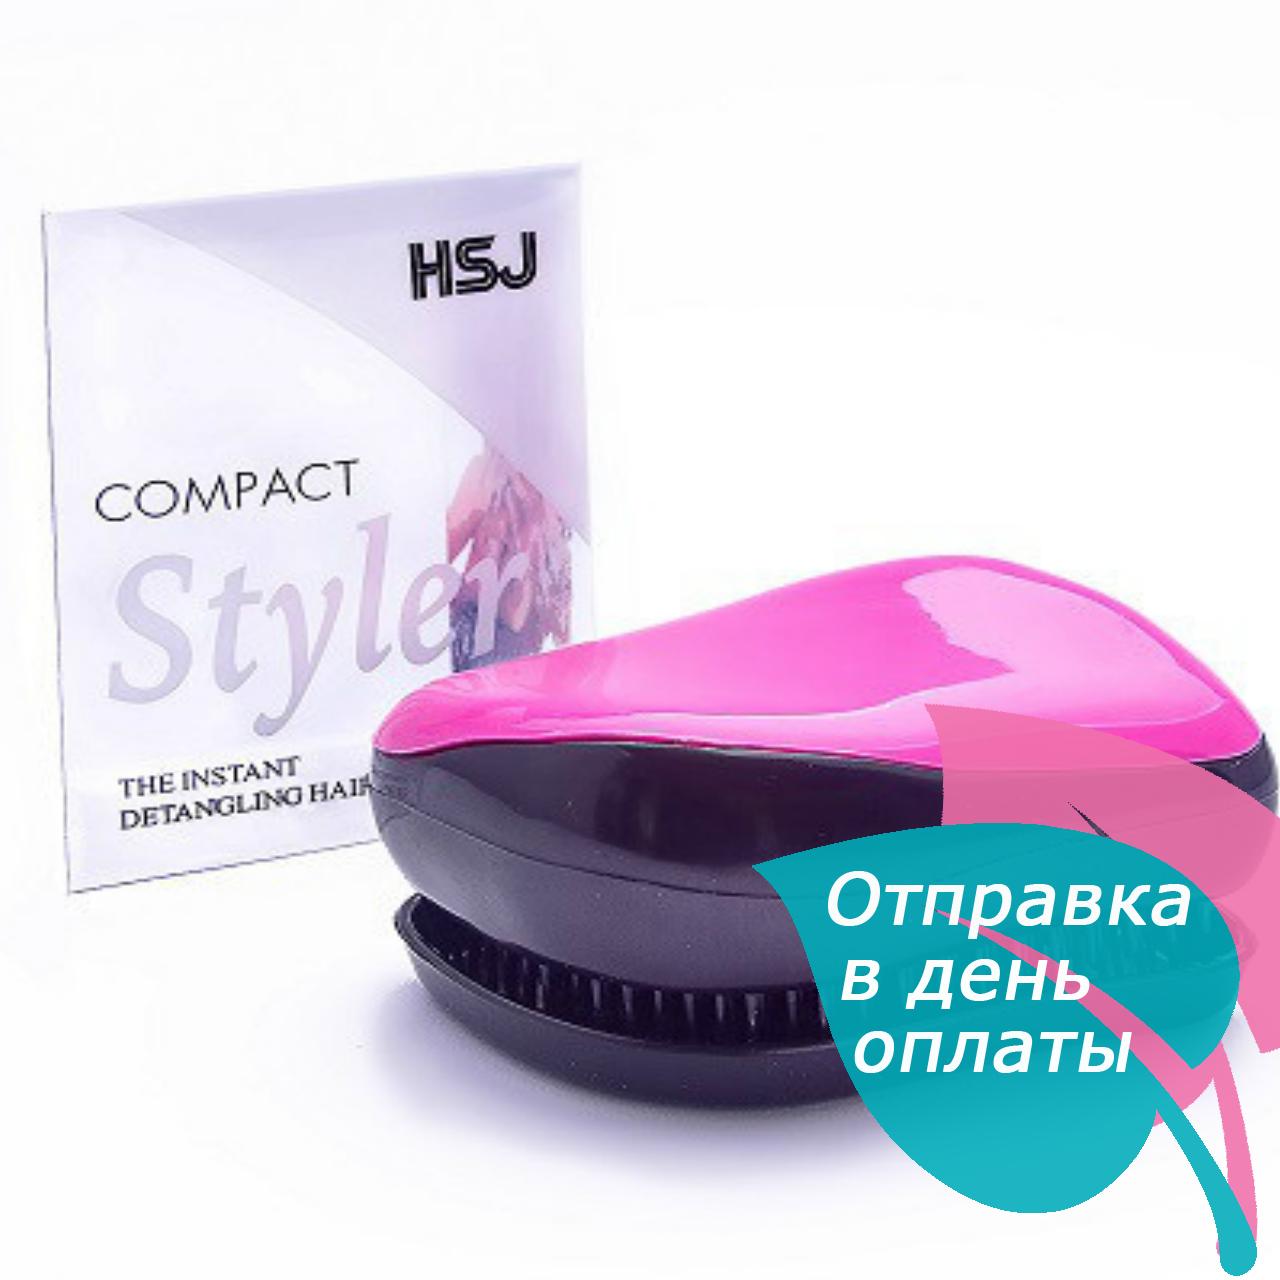 Компактная щетка для волос HSJ Compact Styler